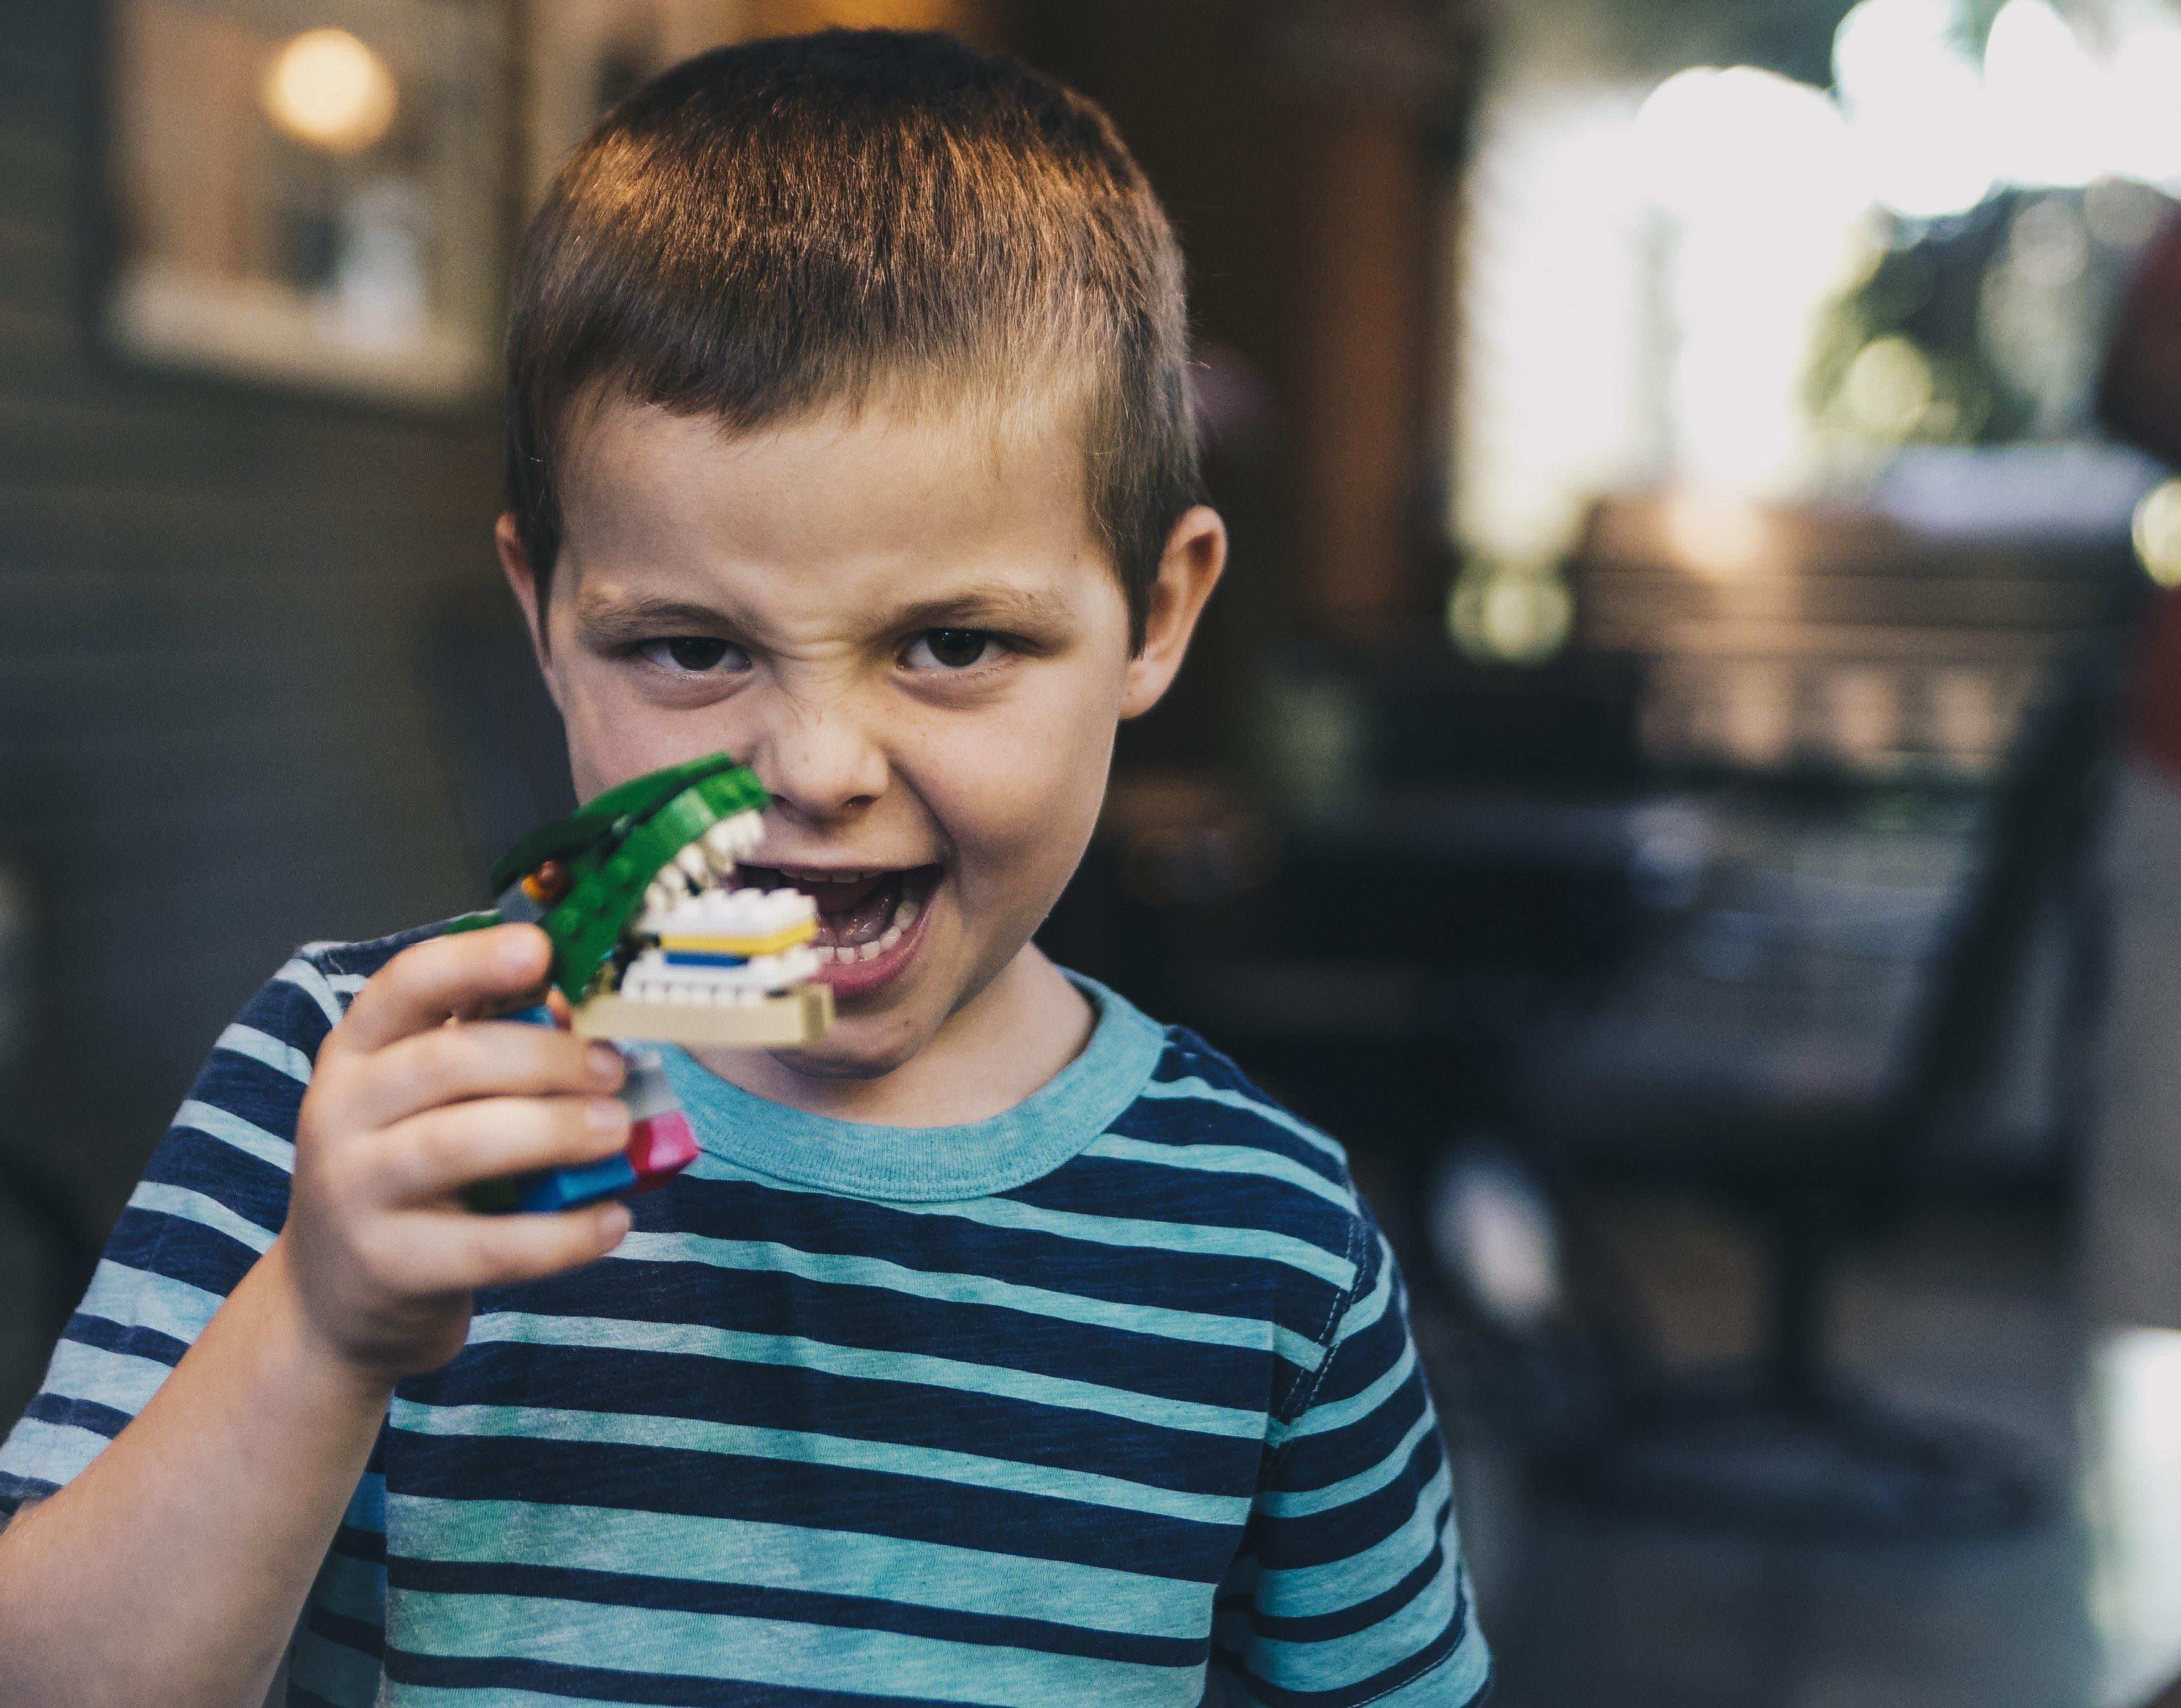 boy-holding-monster-making-funny-face